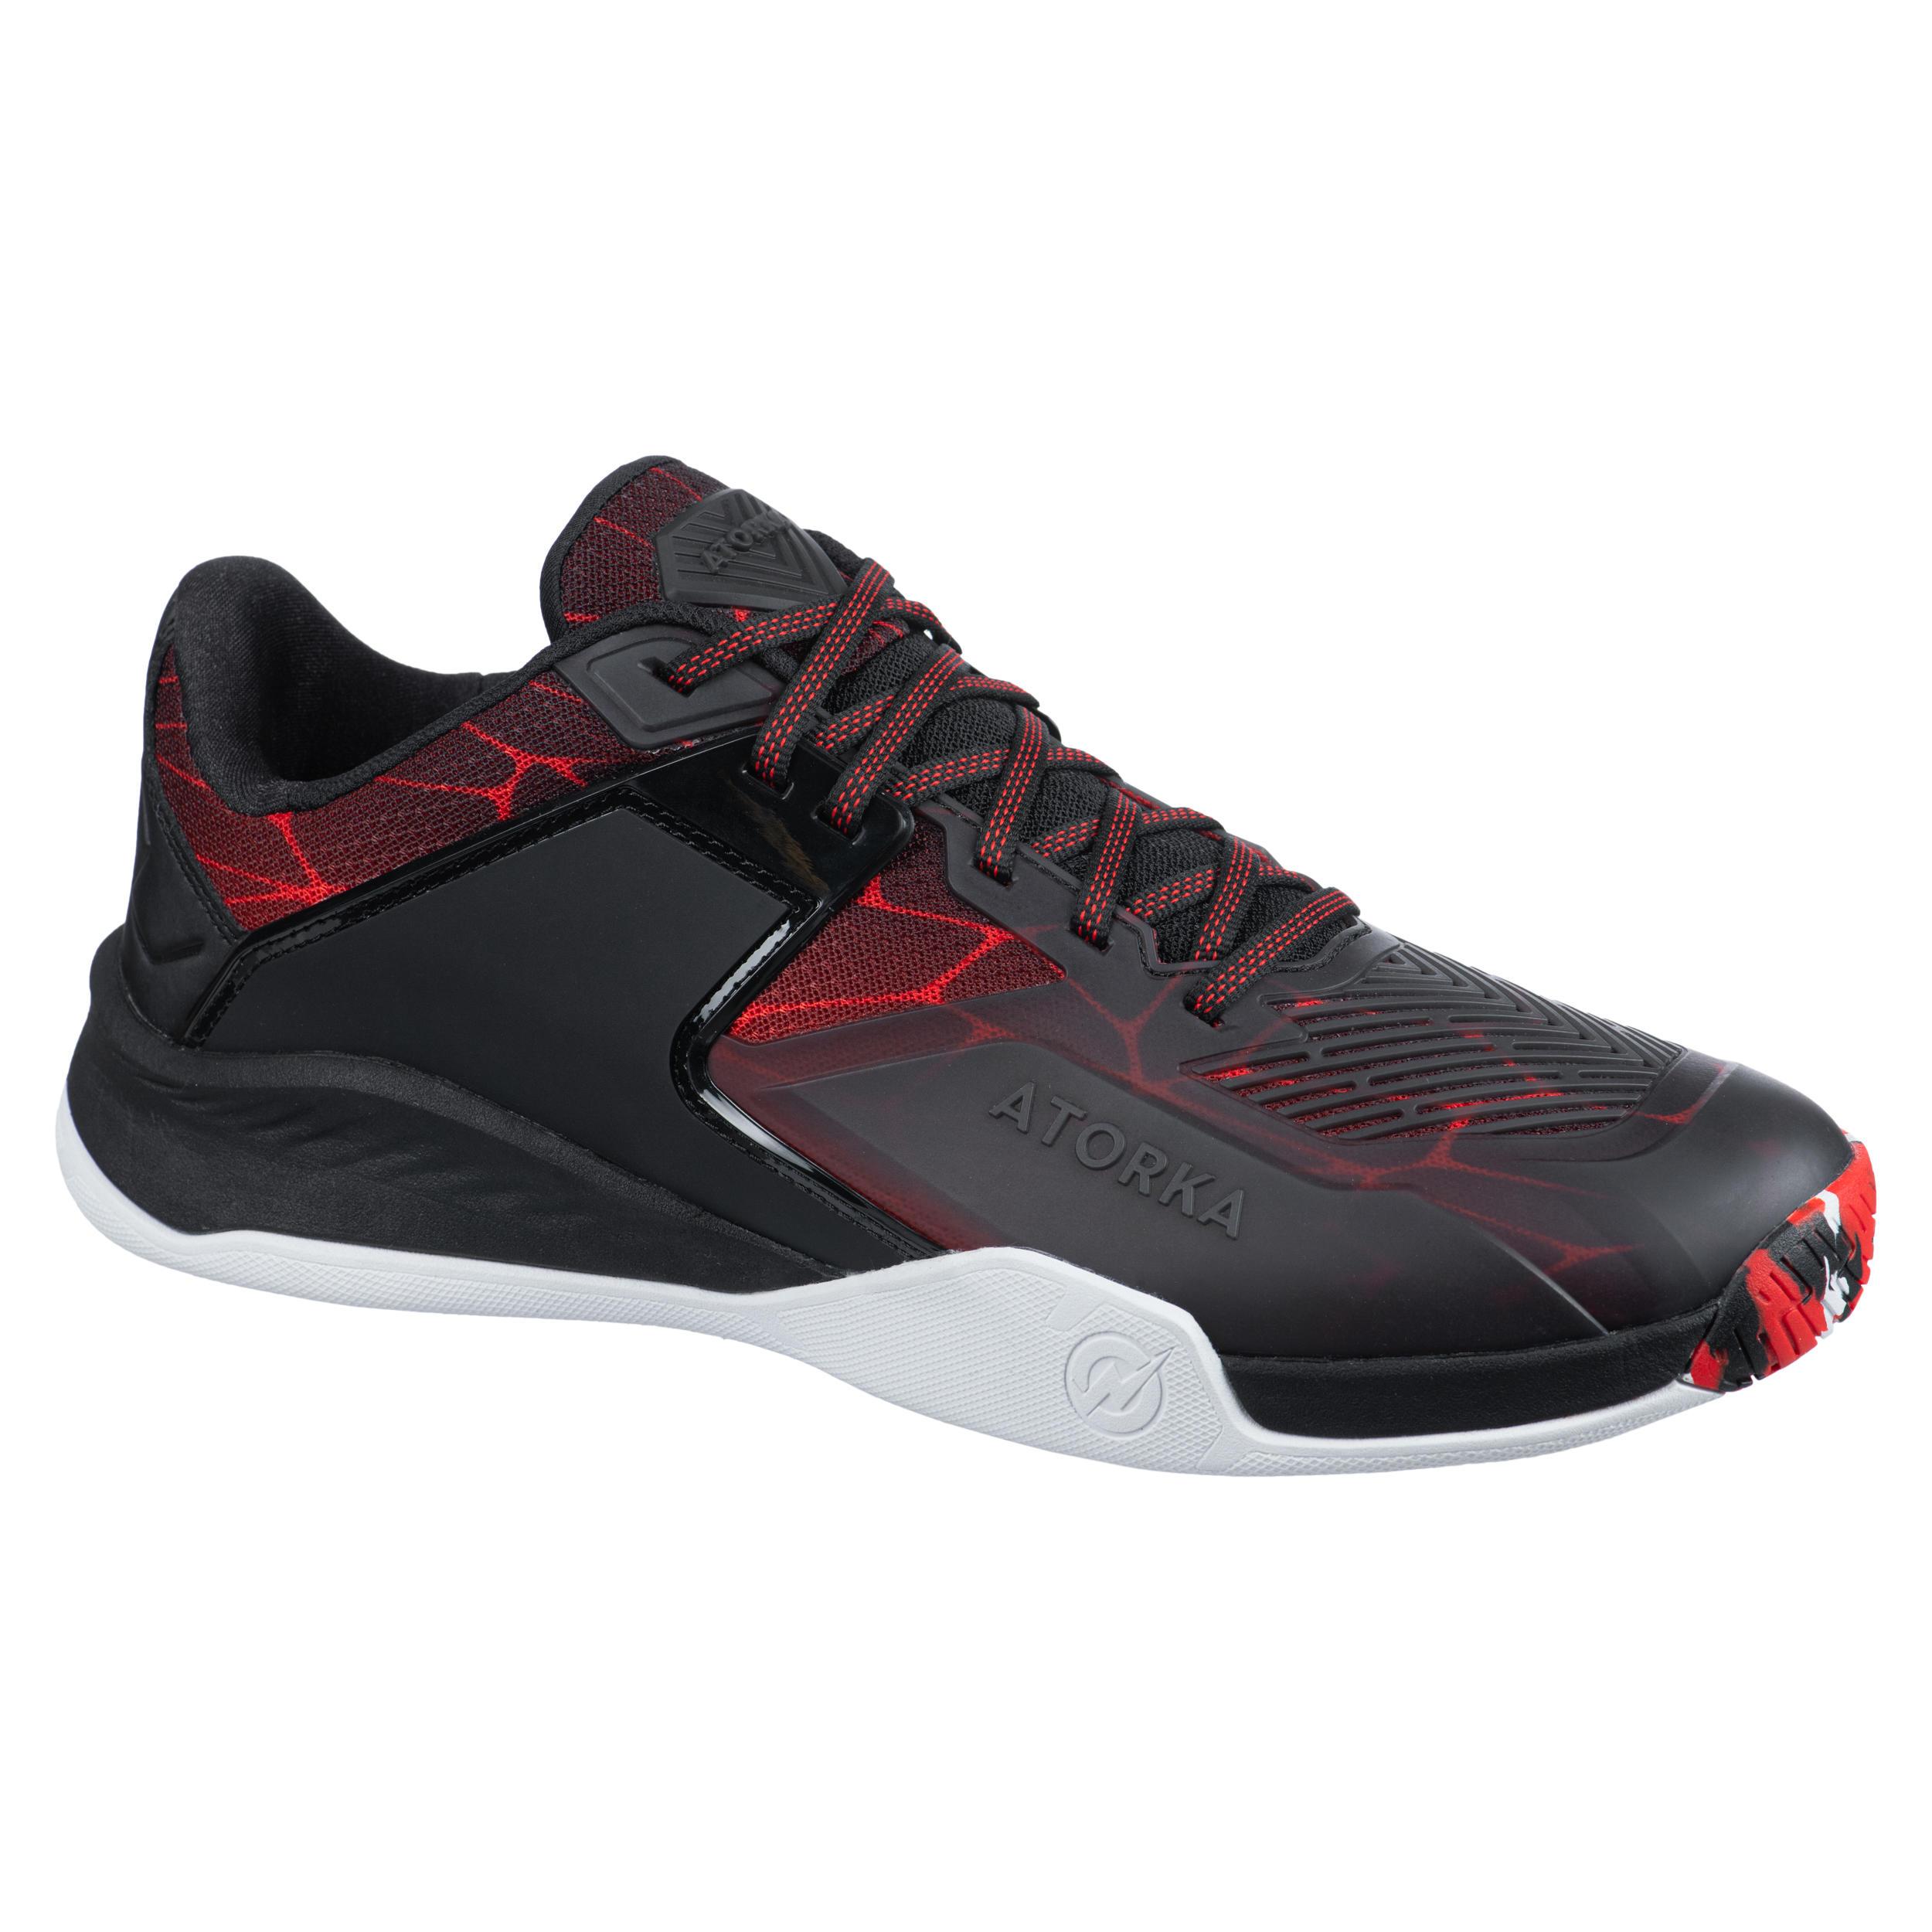 Handballschuhe H900 Stronger Herren magma | Schuhe > Sportschuhe > Handballschuhe | Atorka